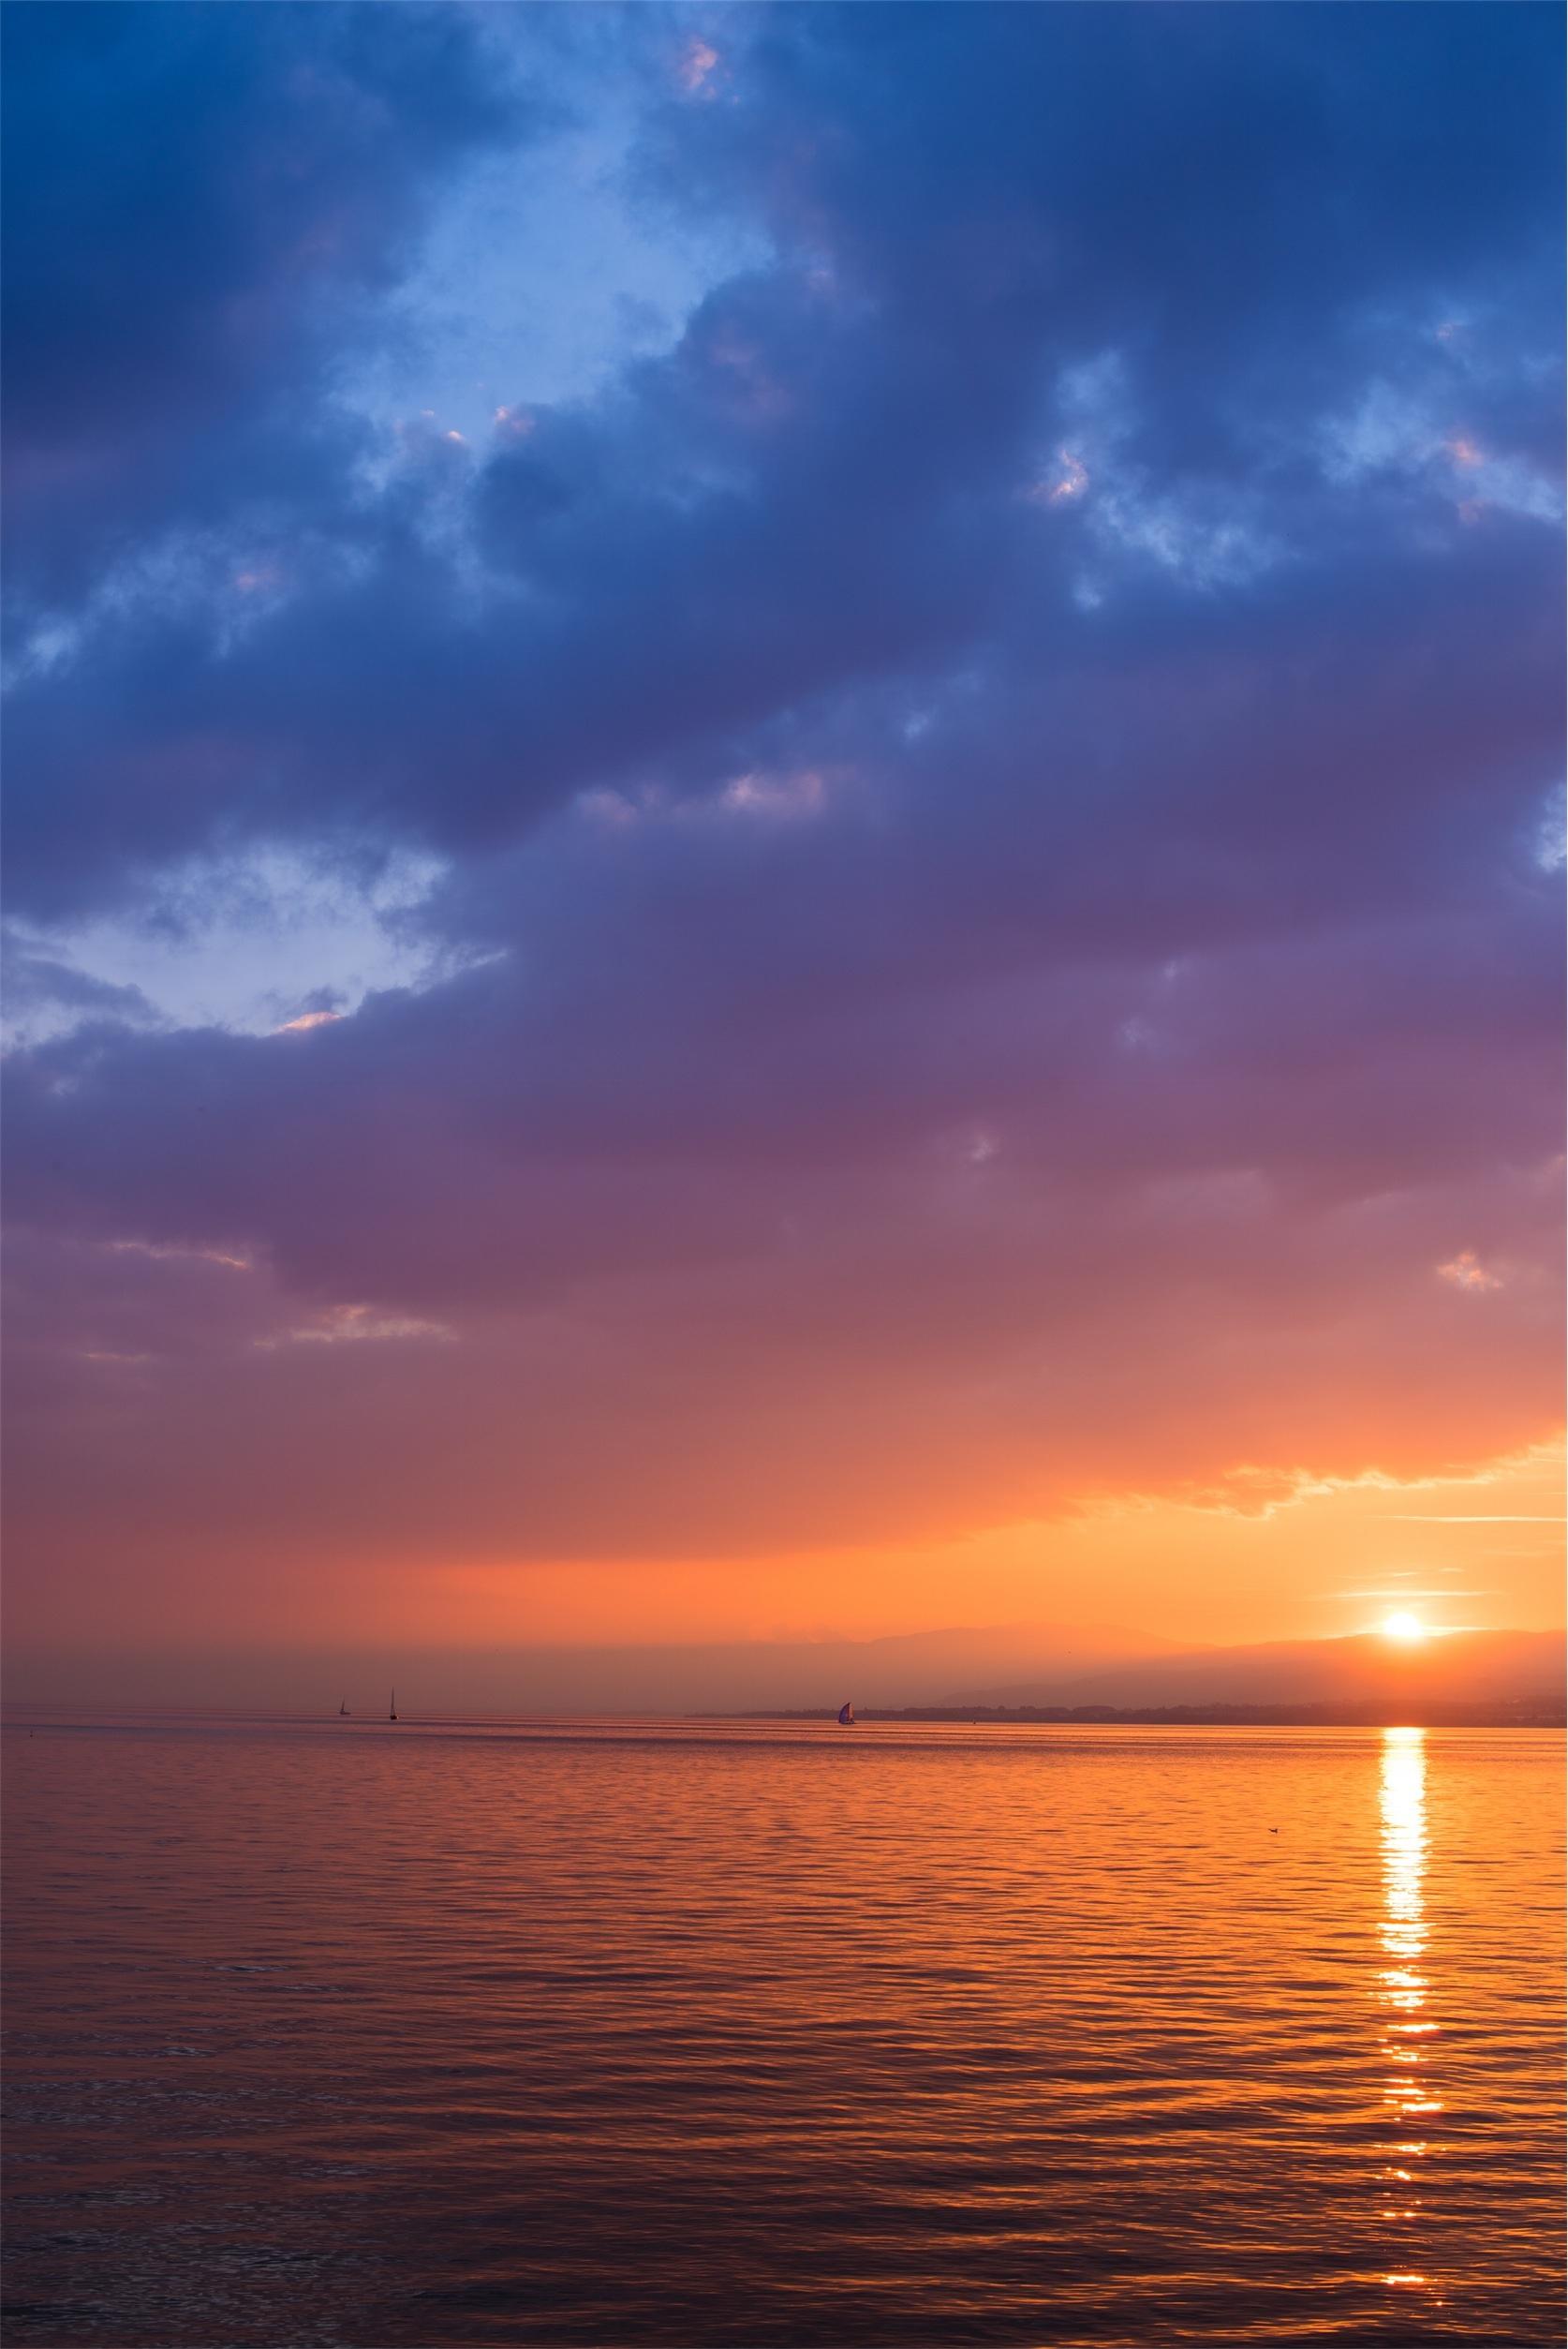 Gambar Pantai Laut Air Lautan Horison Awan Matahari Terbit Matahari Terbenam Sinar Matahari Gelombang Ungu Fajar Suasana Senja Malam Refleksi Awan Awan Indah Perasaan Senang Sesudah Mengalami Kesenganan Ombak Langit Merah Di